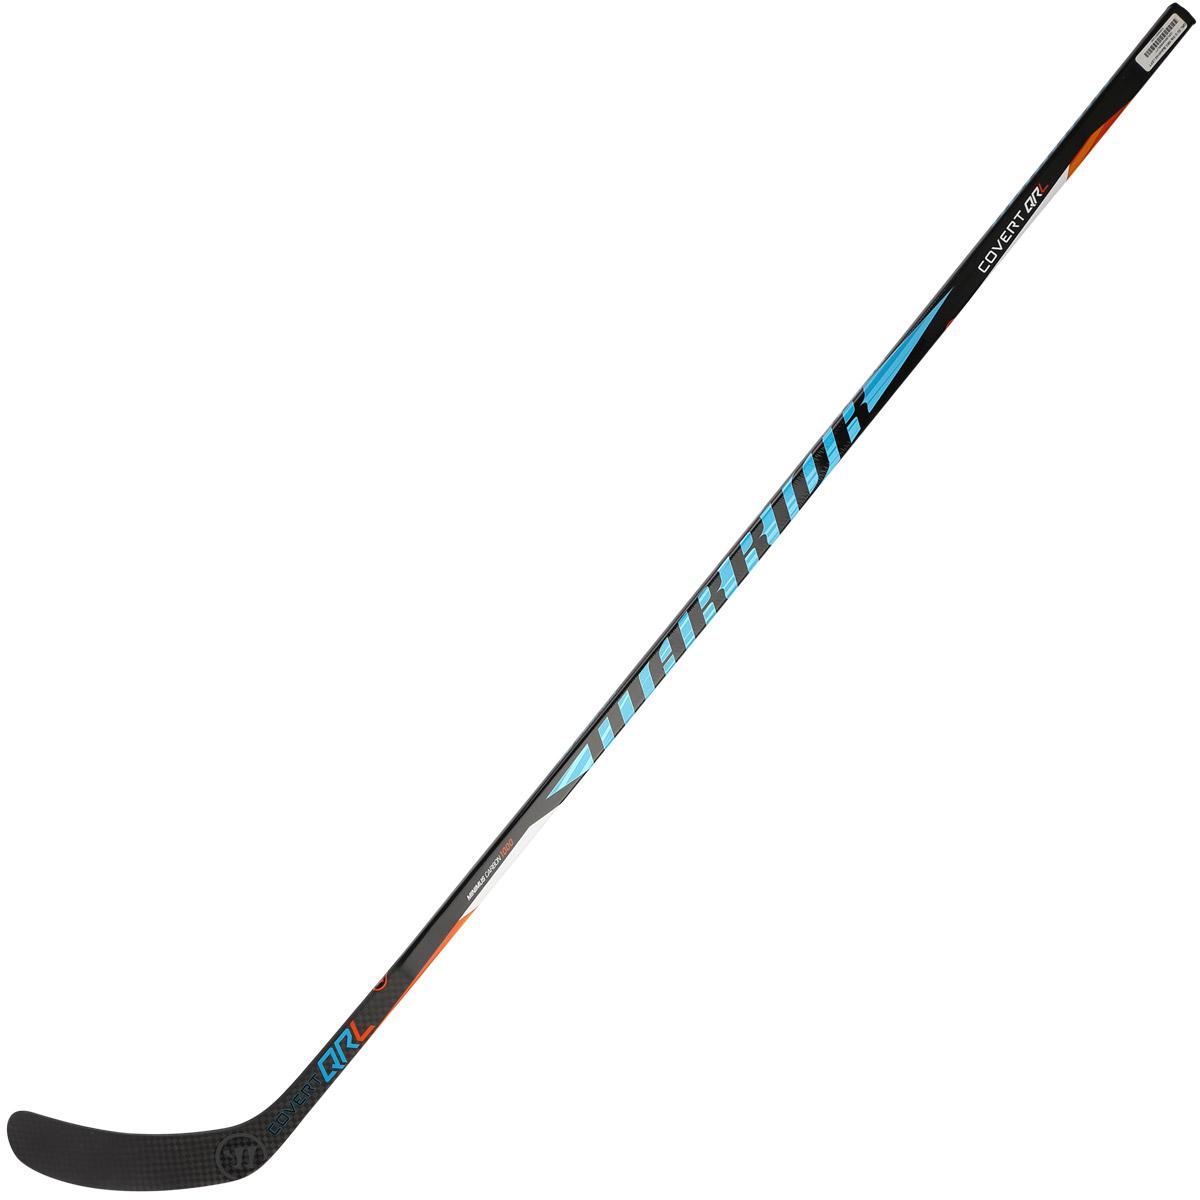 хоккейная клюшка картинки